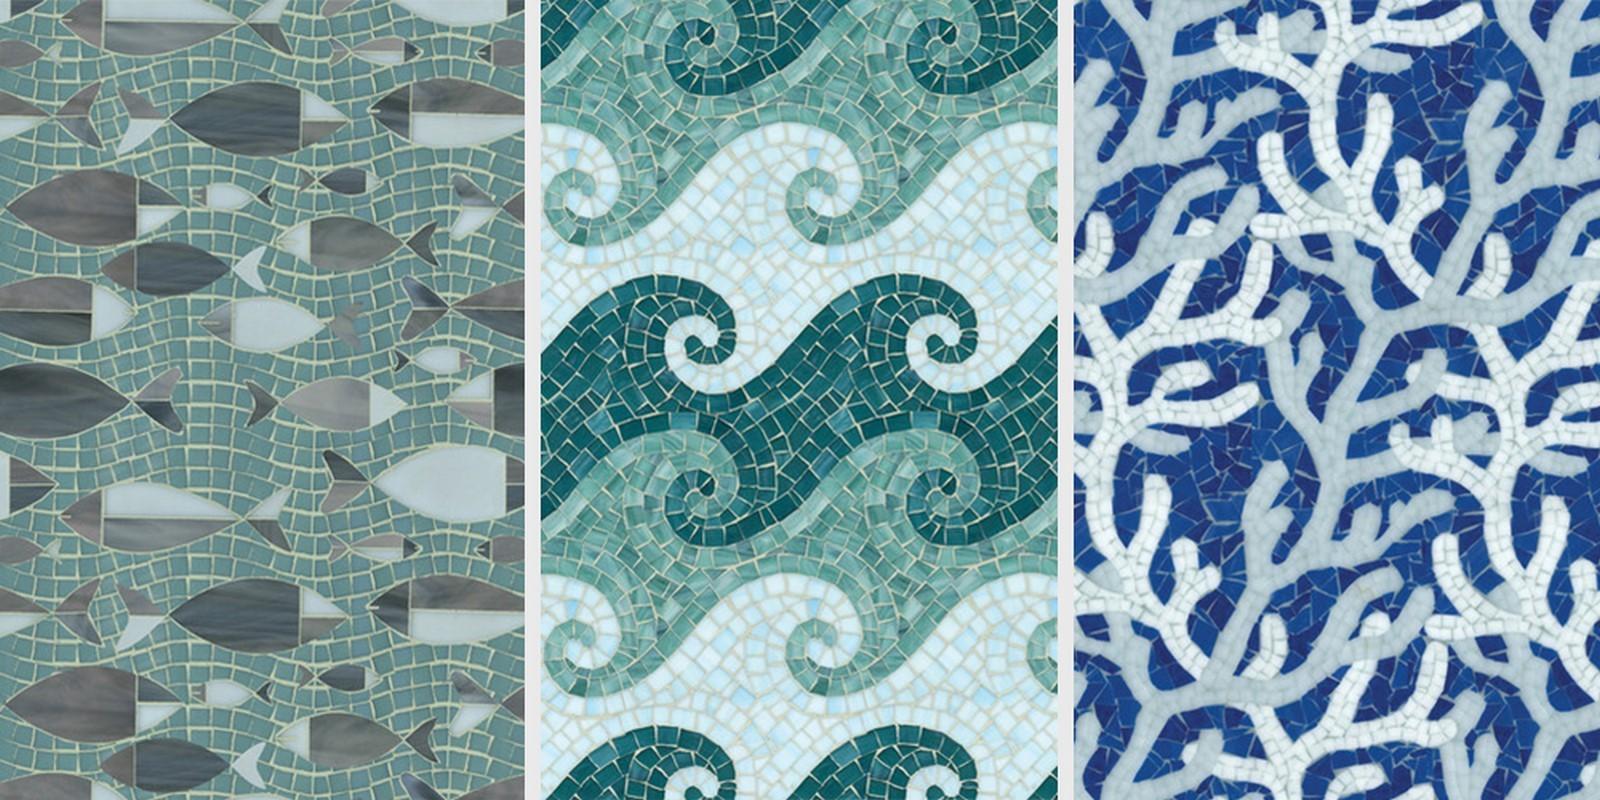 25 flooring patterns for Swimming Pools - Sheet17